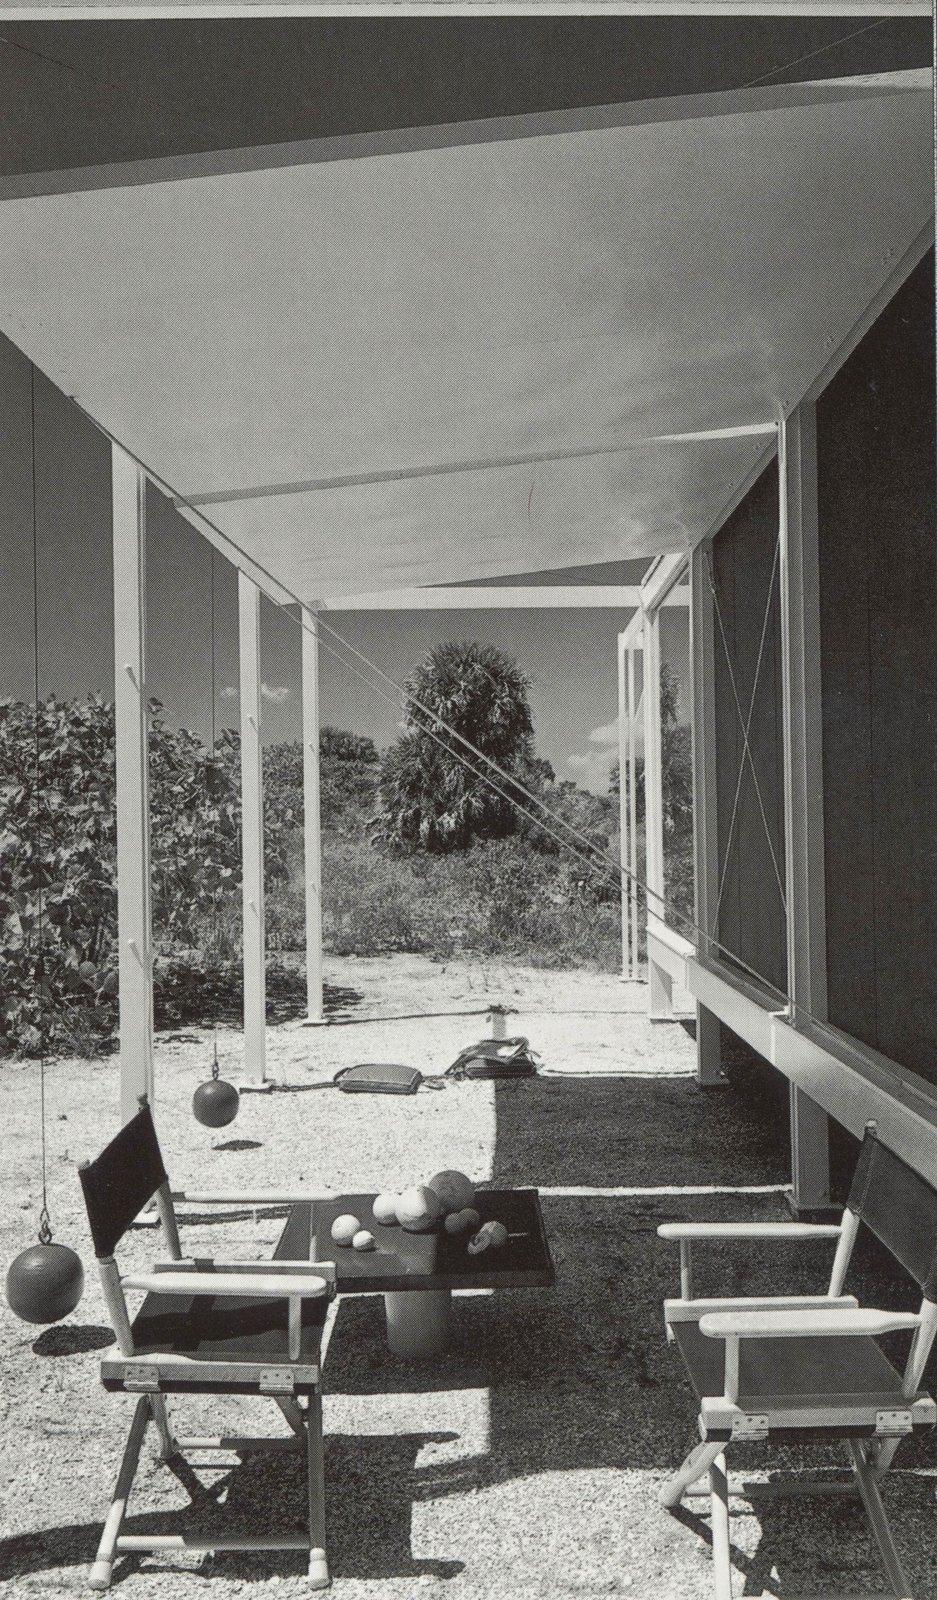 Walker guest house, Paul Rudolph, architect.  Surf Shacks